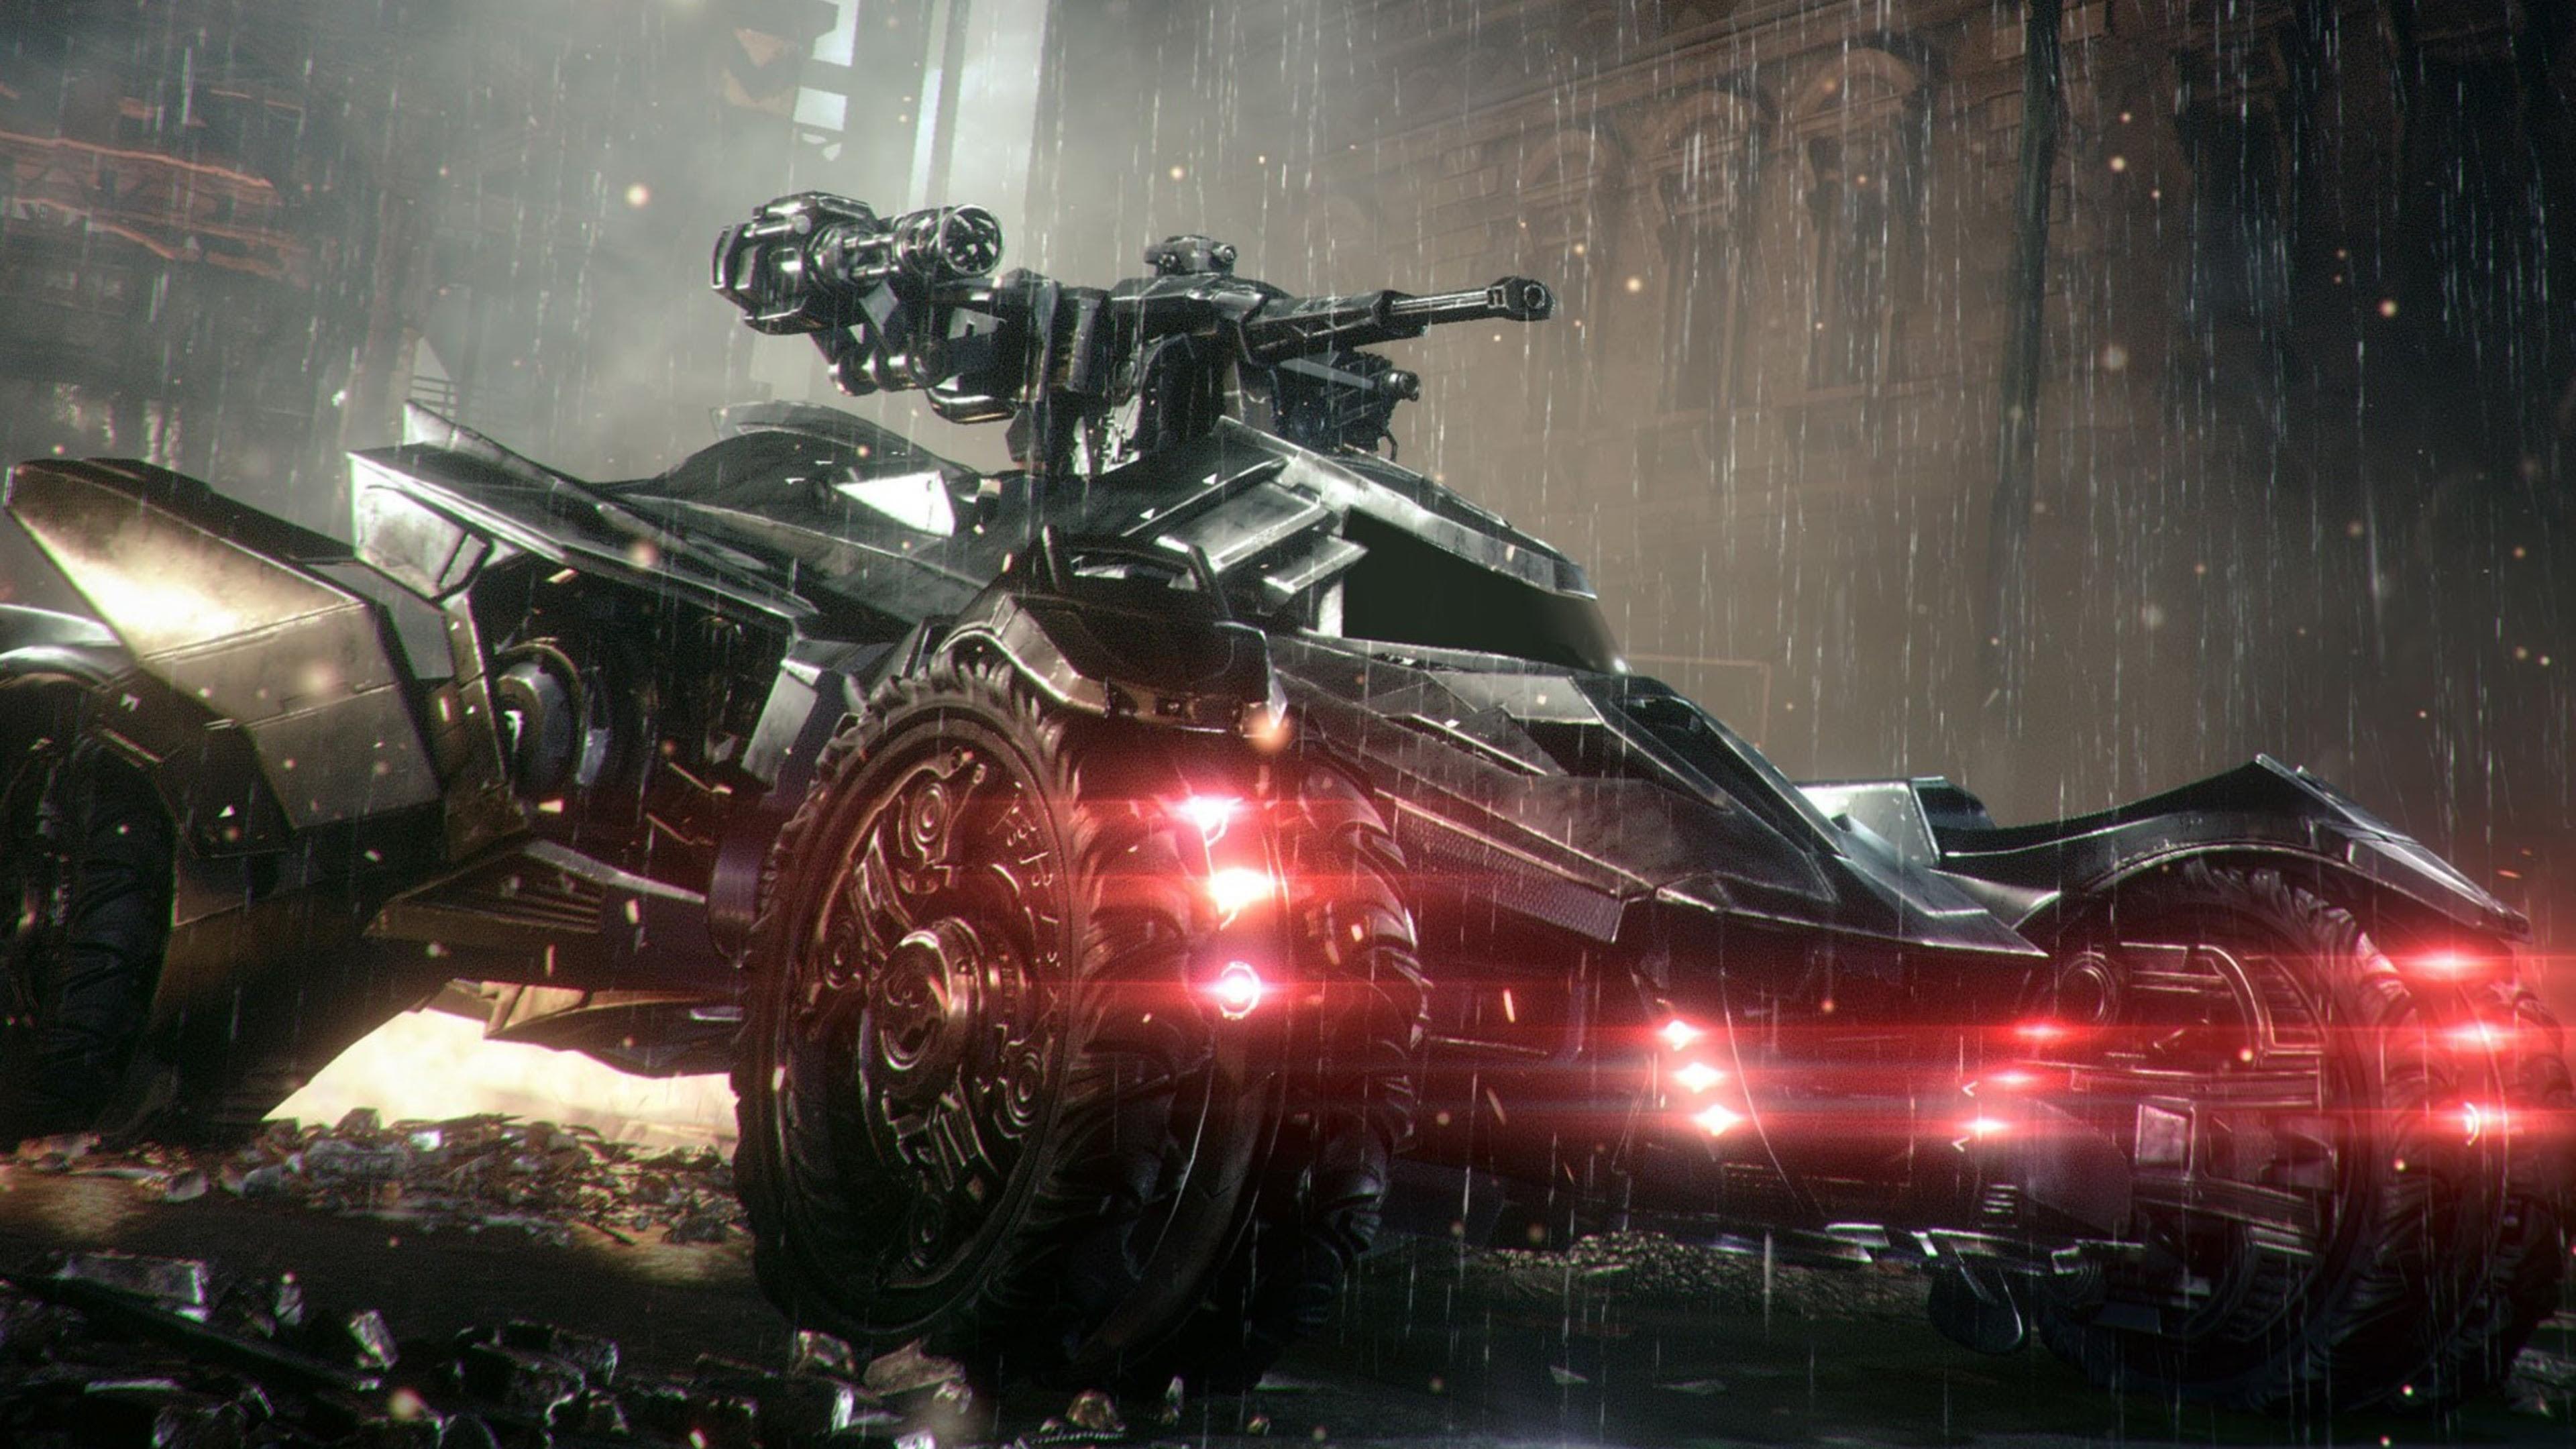 1440x900 Batmobile In Arkham Knight 1440x900 Resolution Hd 4k